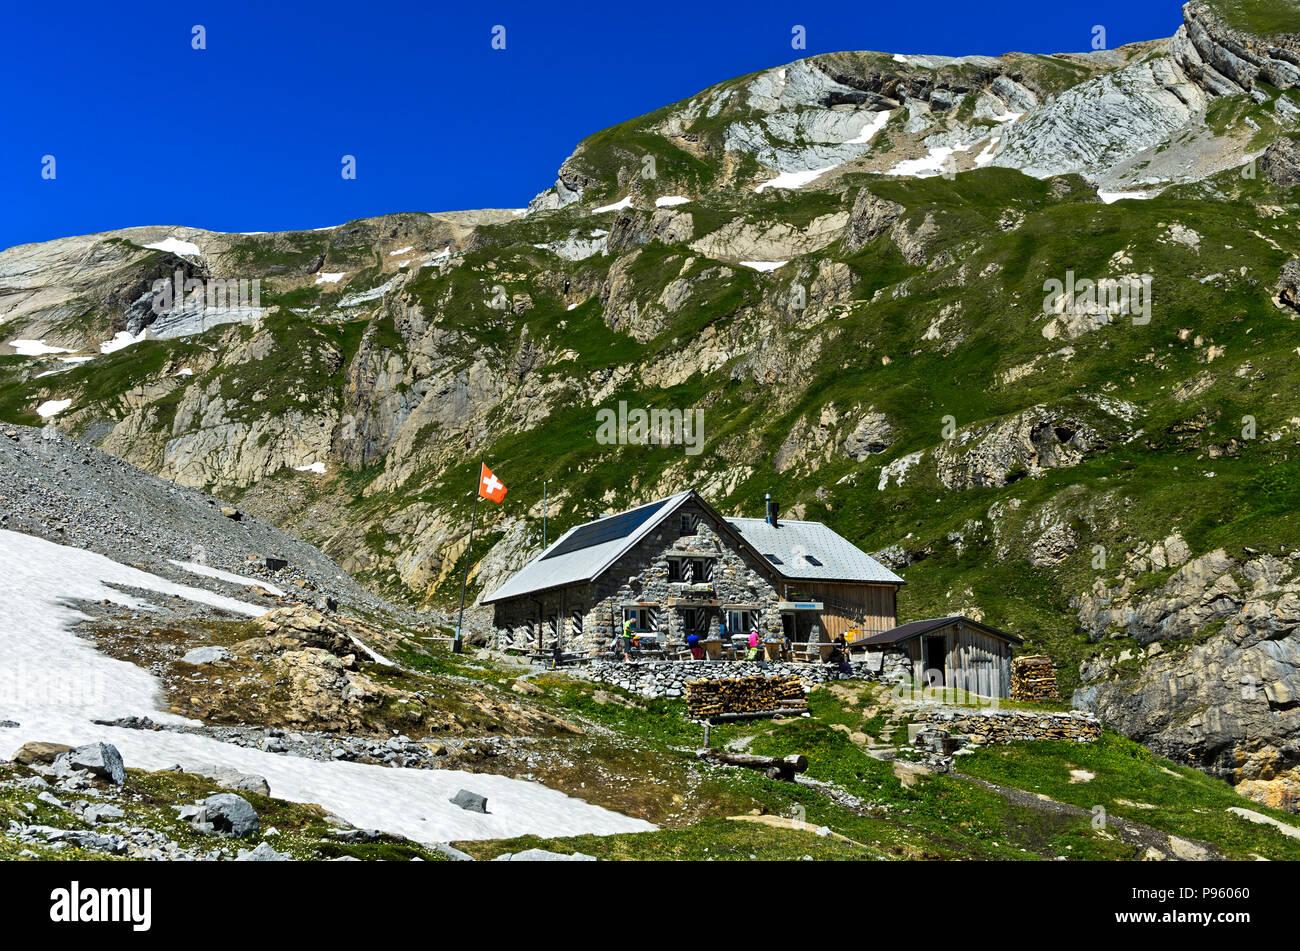 Berghütte Wildhornhütte der Schweizer Alpin Club, Berner Alpen, Lenk, Schweiz Stockbild